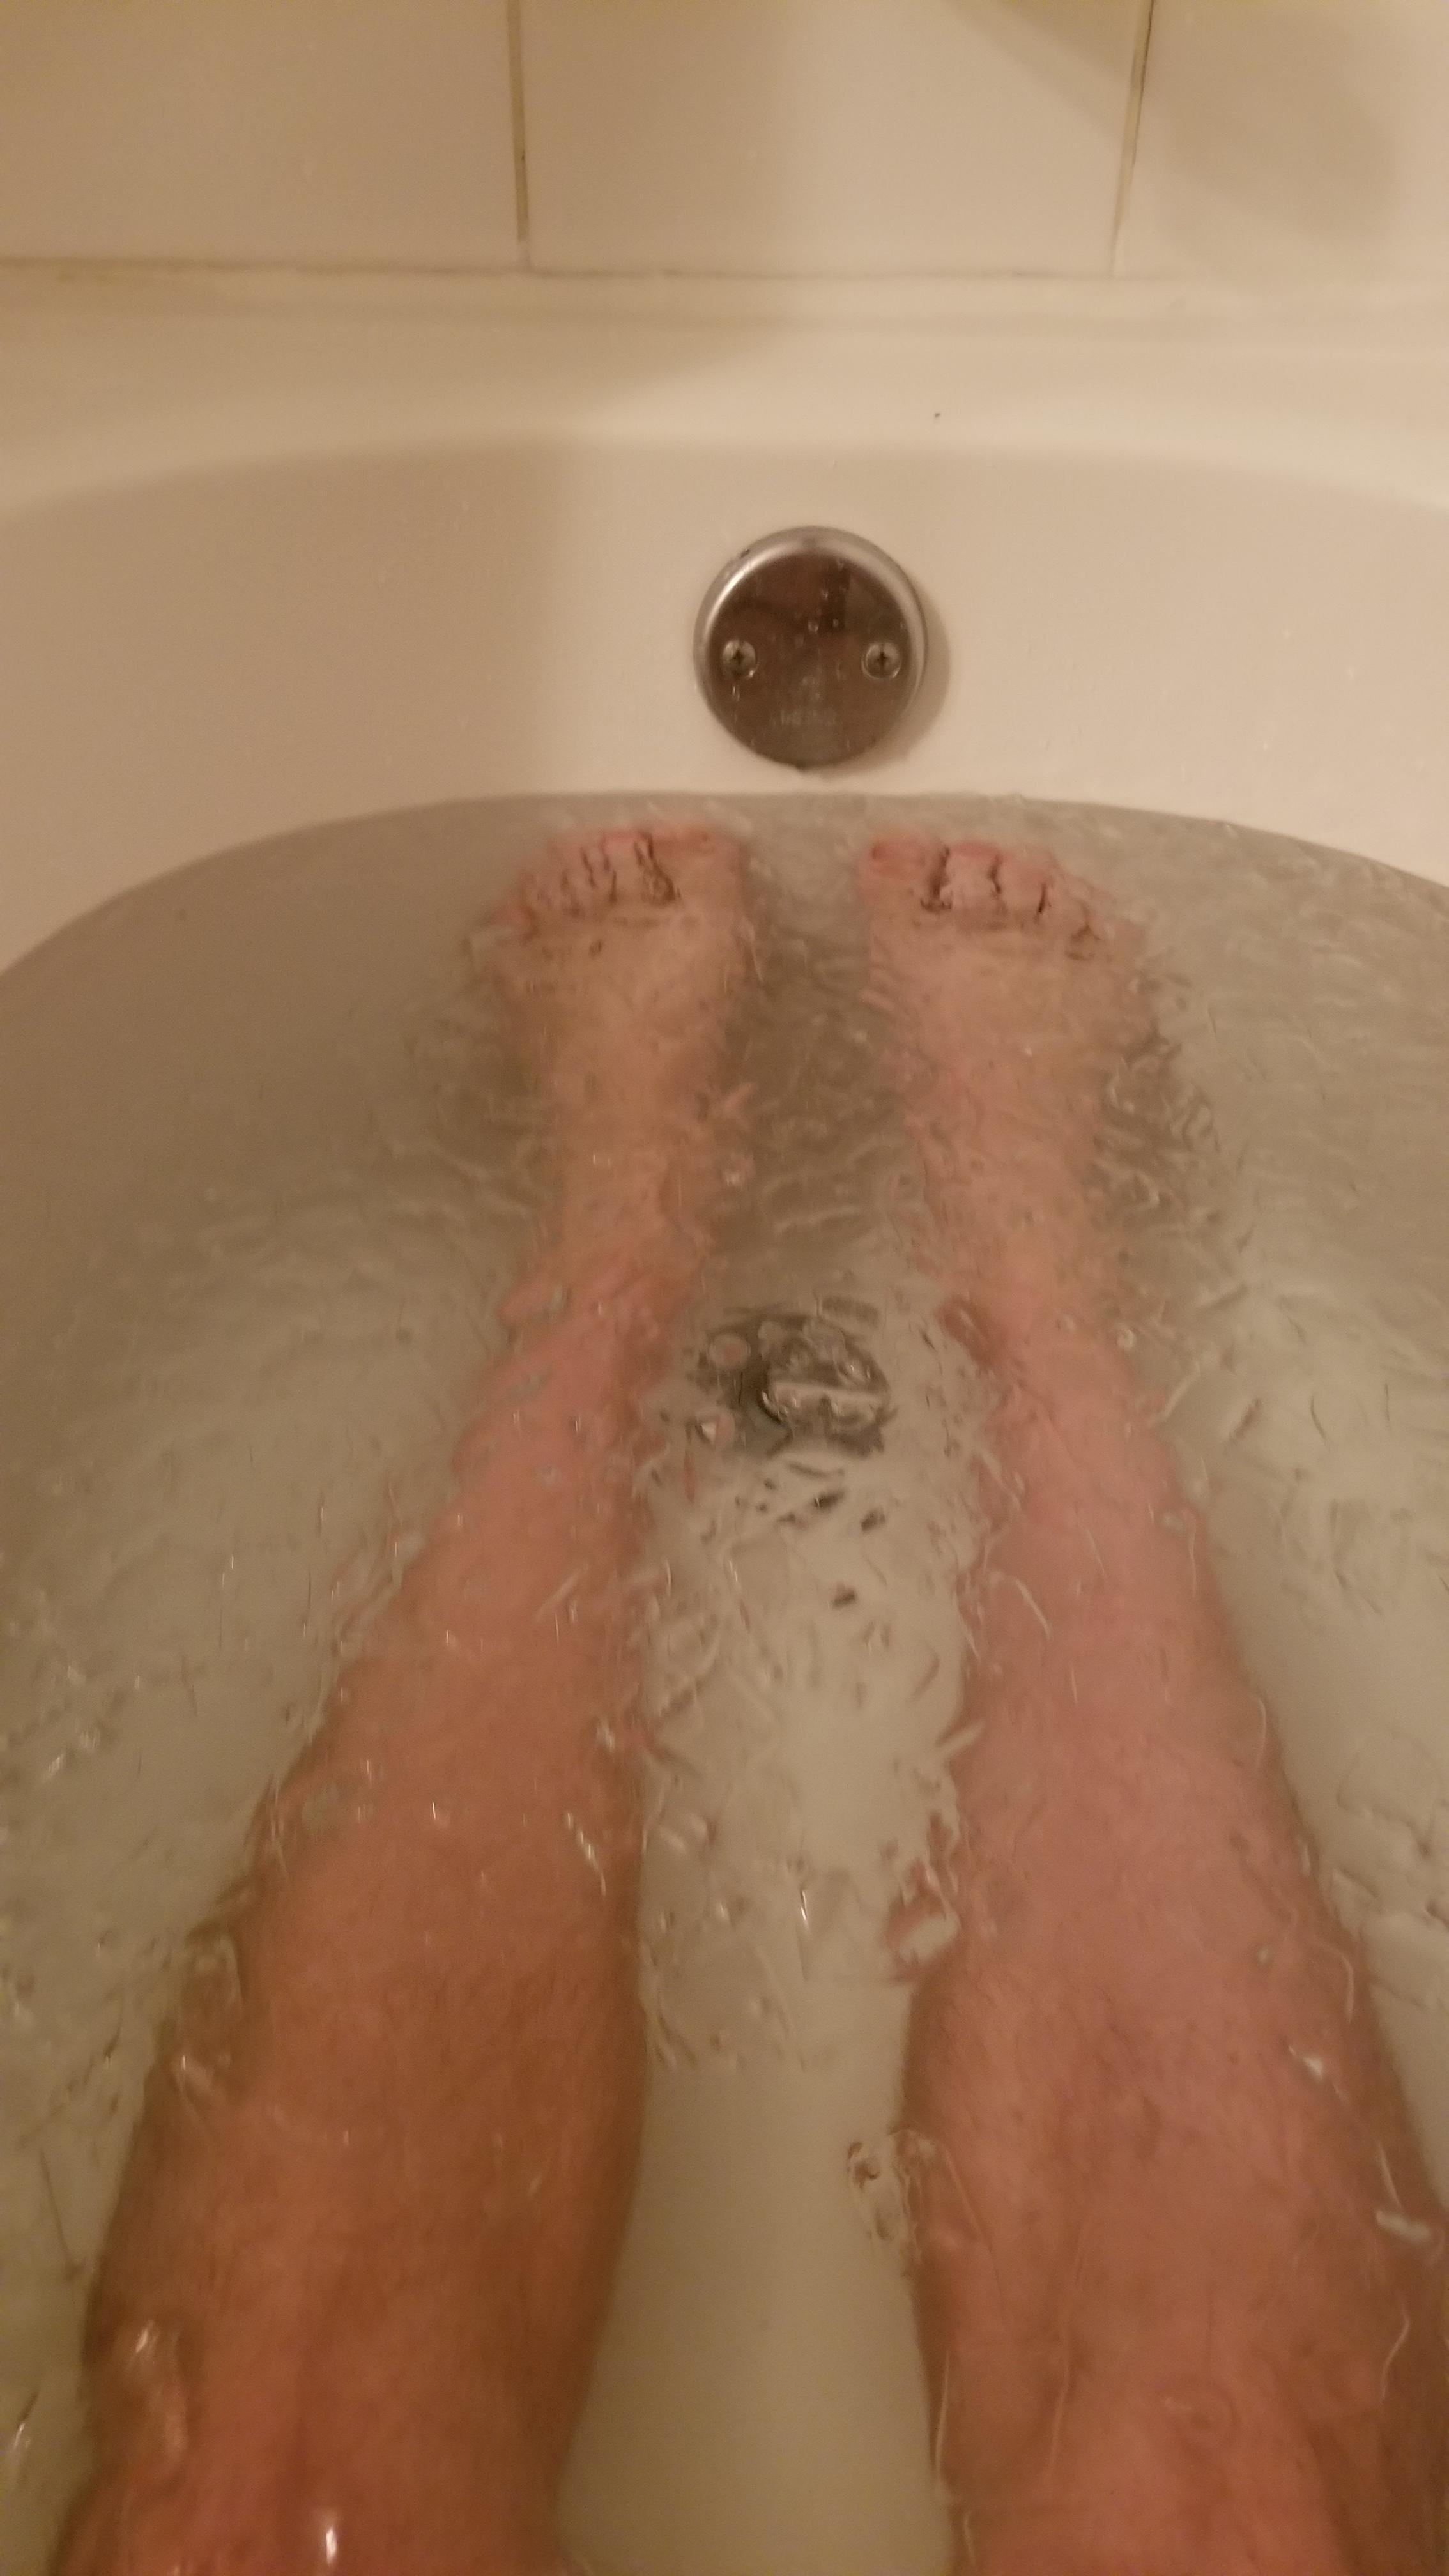 Post race ice bath.